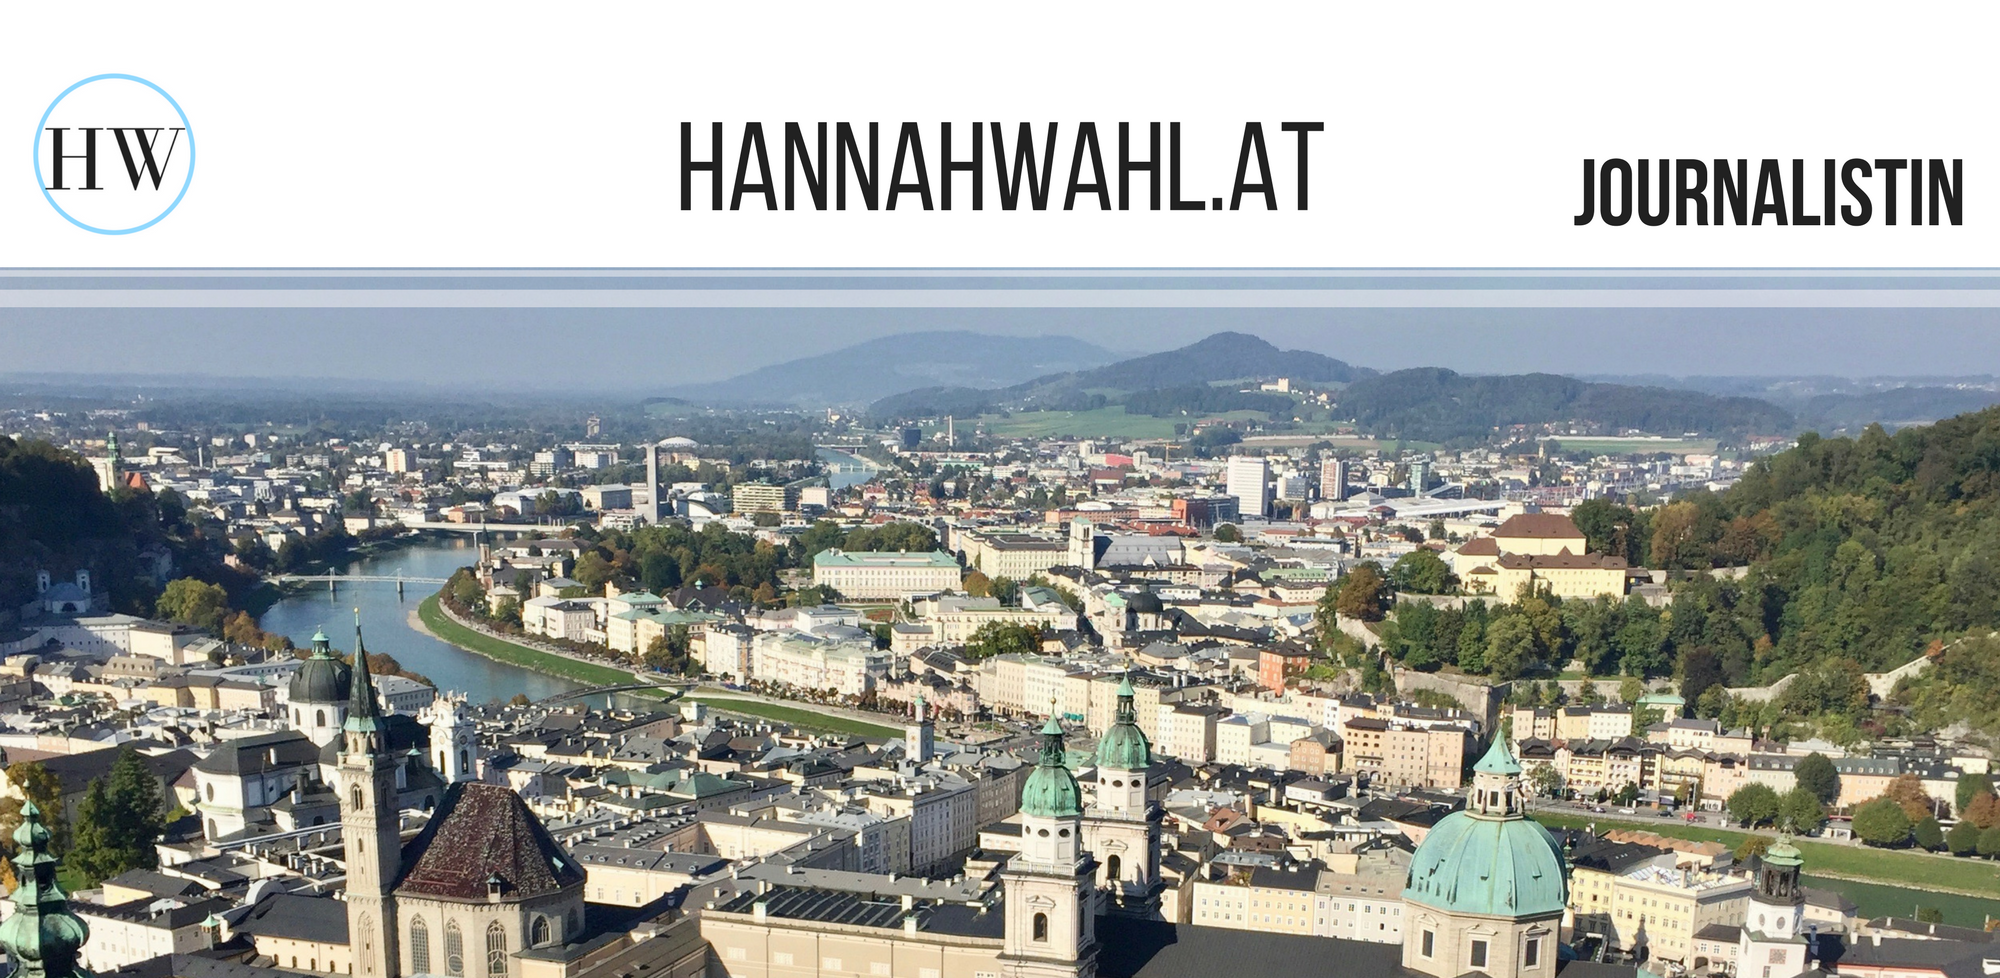 Hannah Wahl